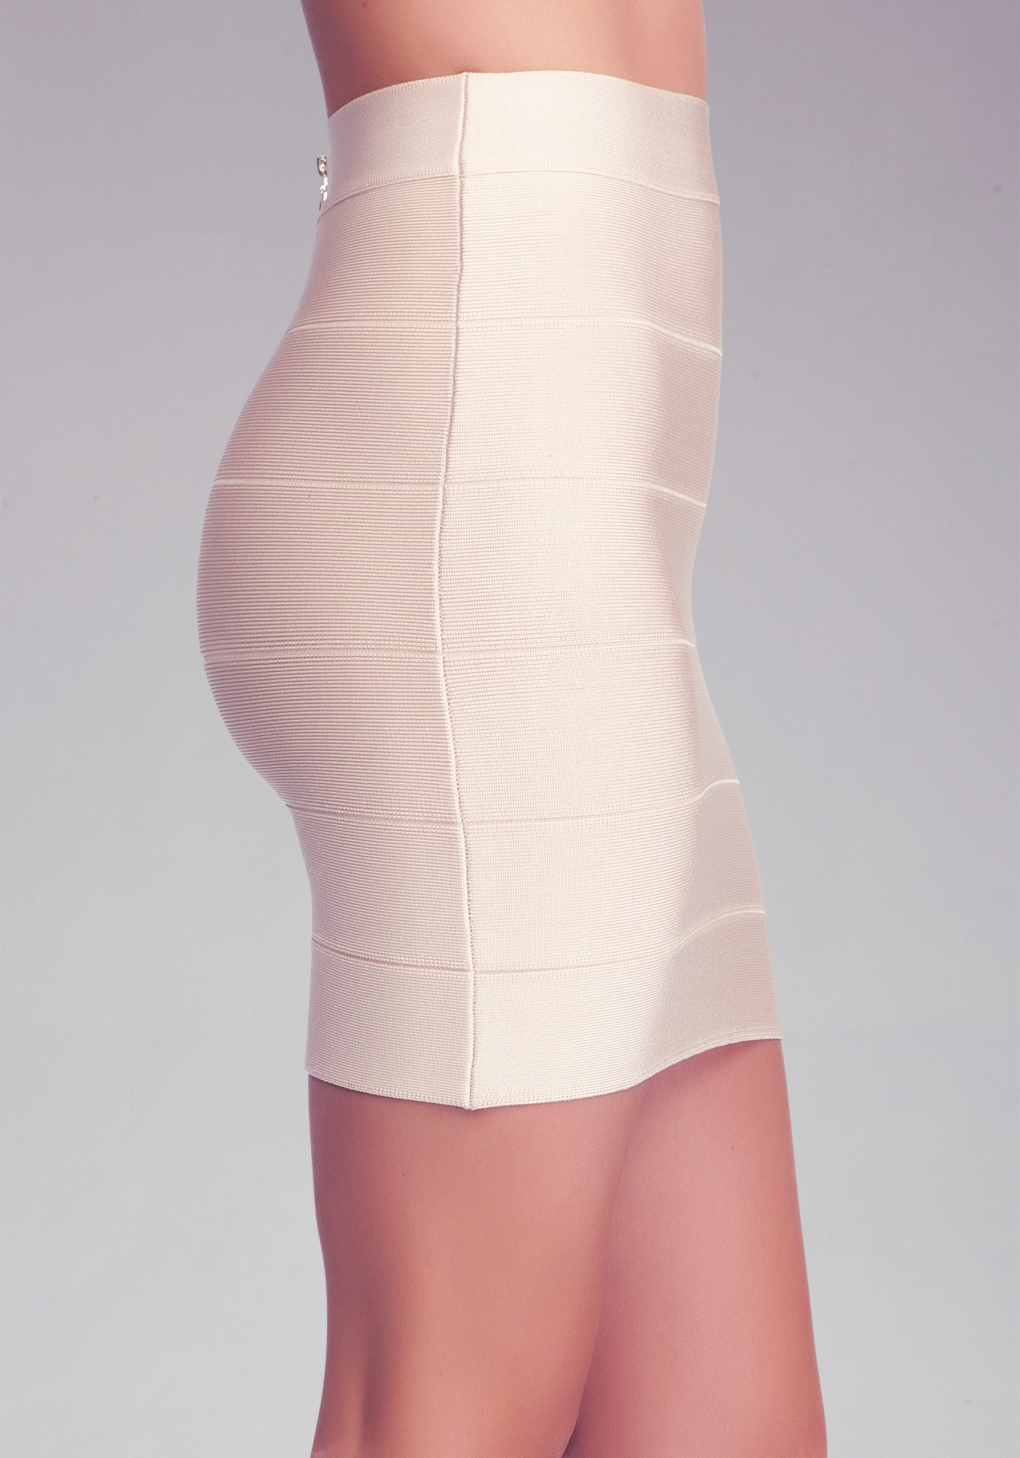 Lyst  Bebe Solid Bandage Skirt in Natural